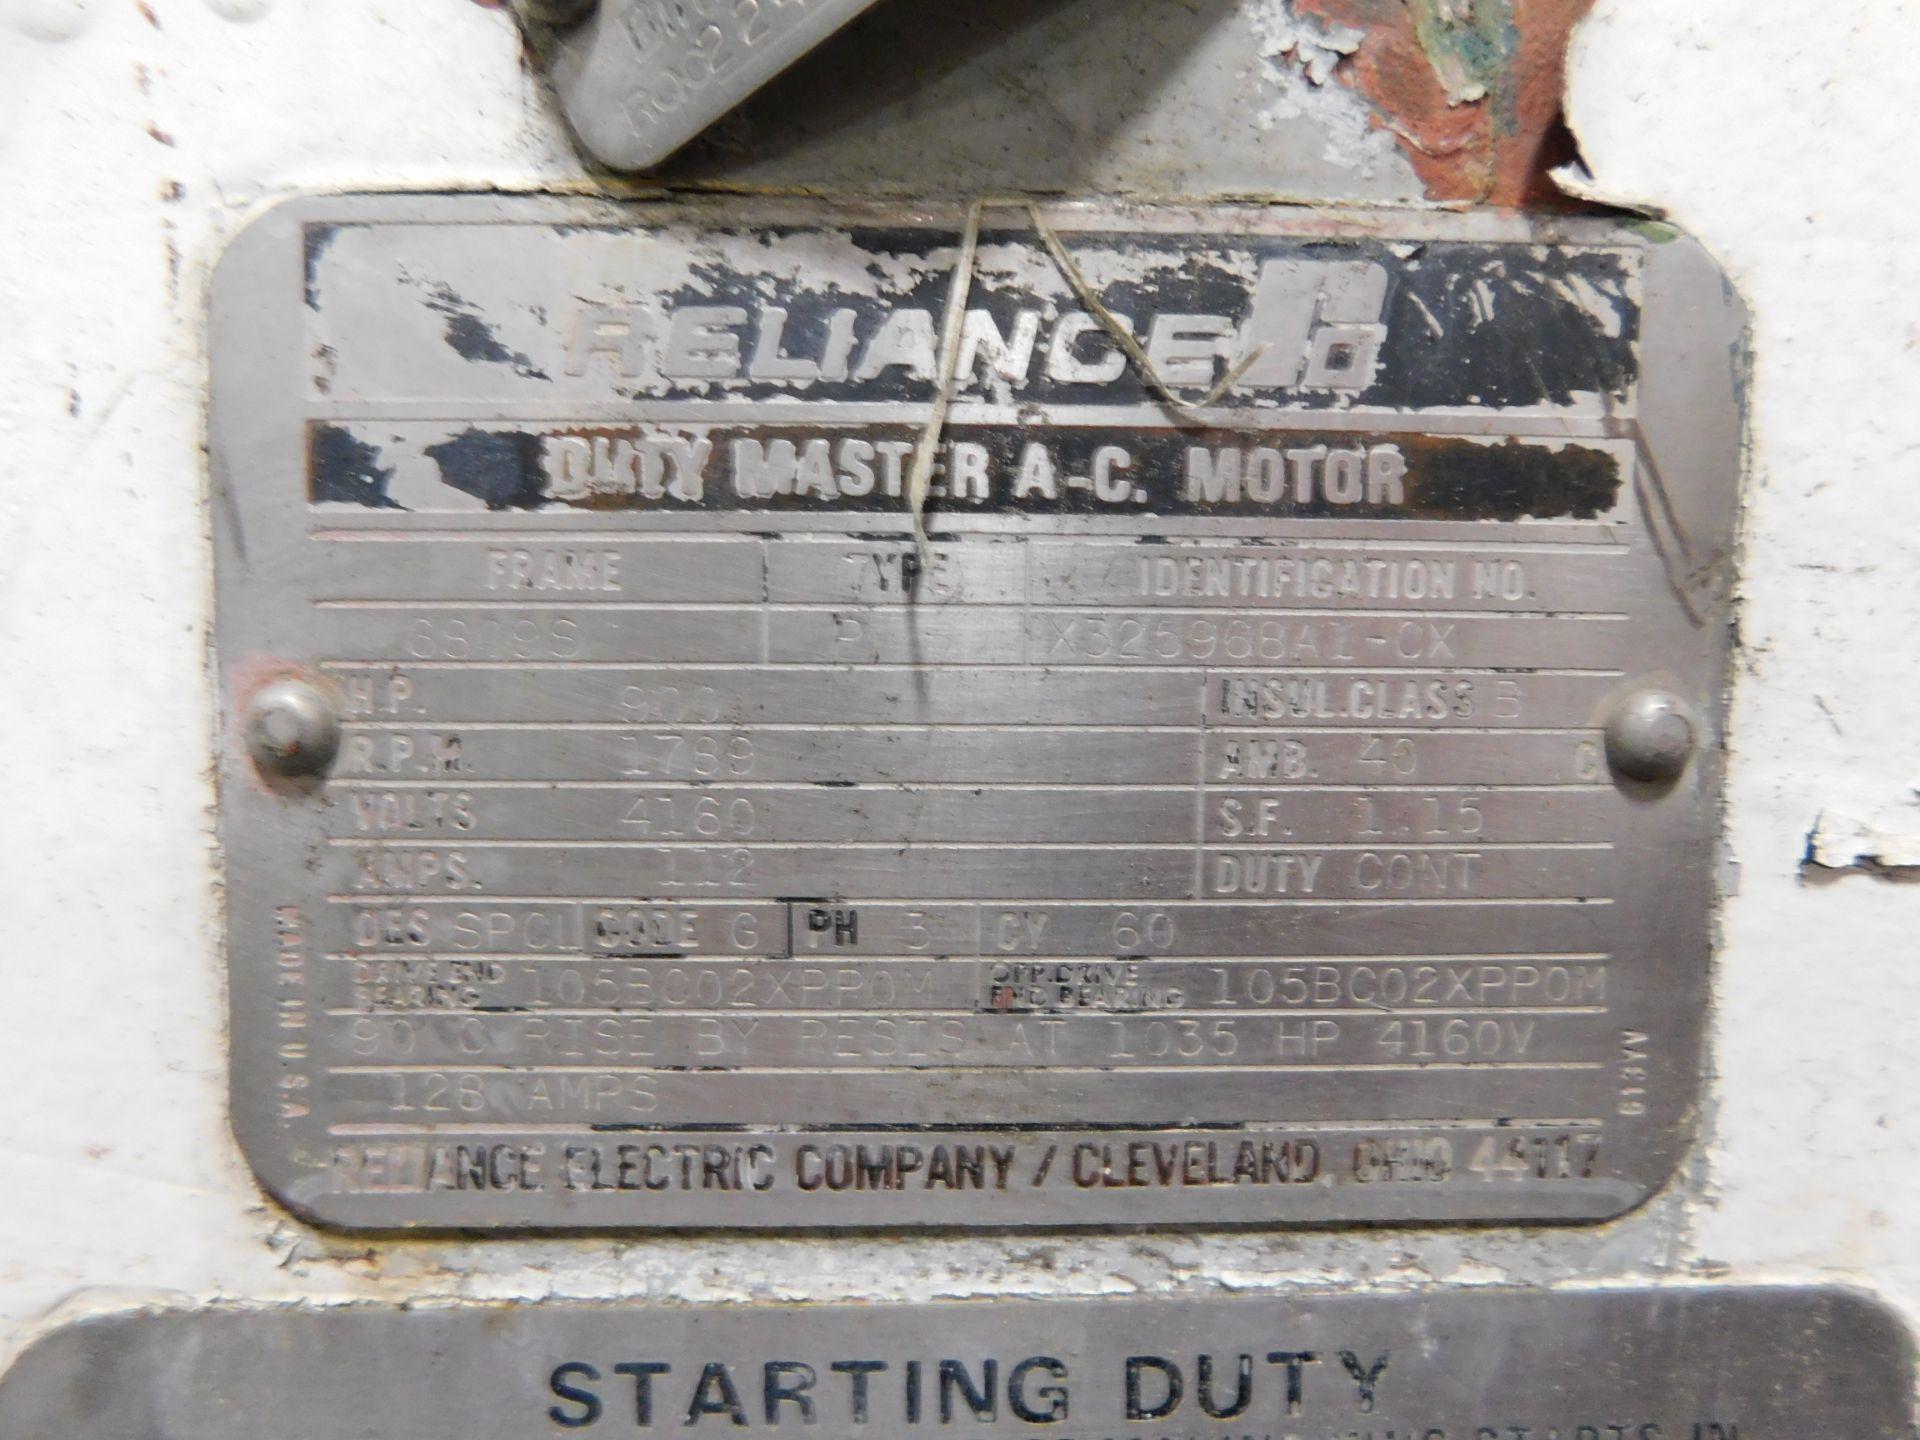 Reliance AC Duty Master Motor. 900 HP. 3 Ph. 60 Hz. 4160 V. 1789 RPM. 6809S. Type P. - Image 7 of 7